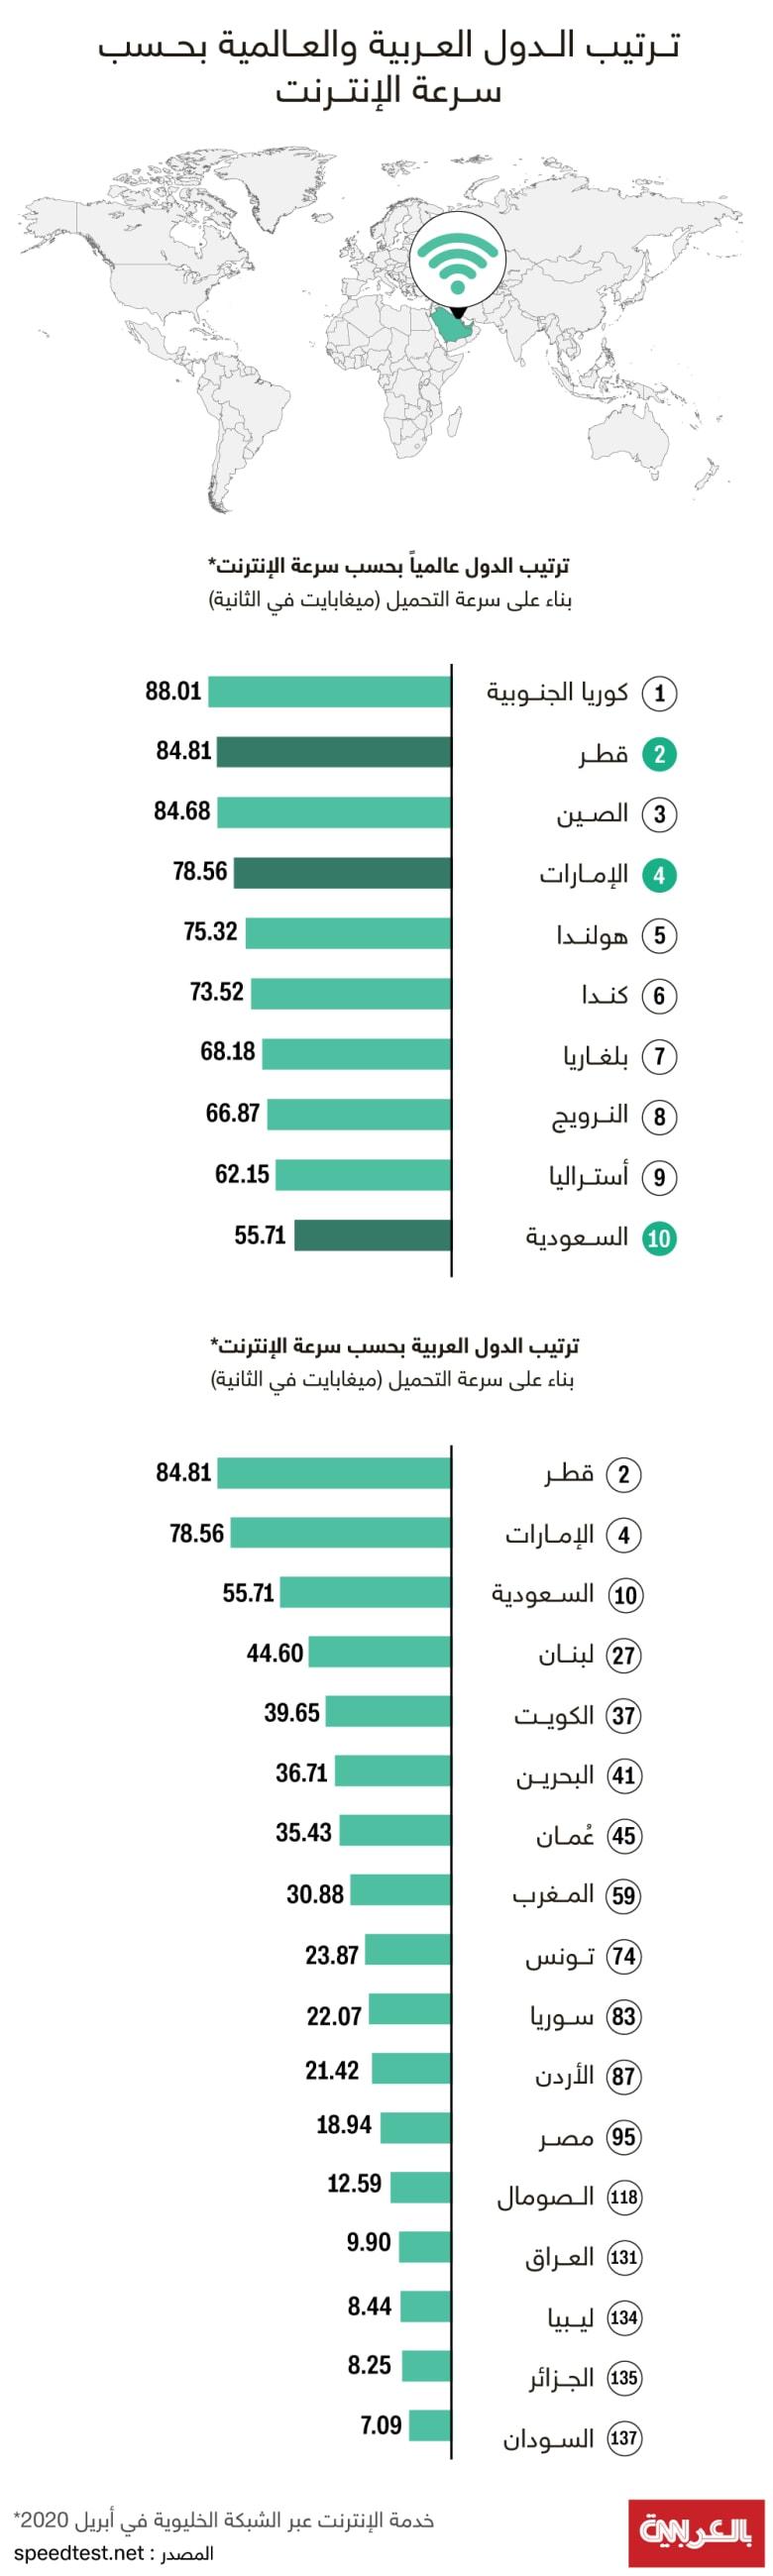 ranking-fastest-internet-2020